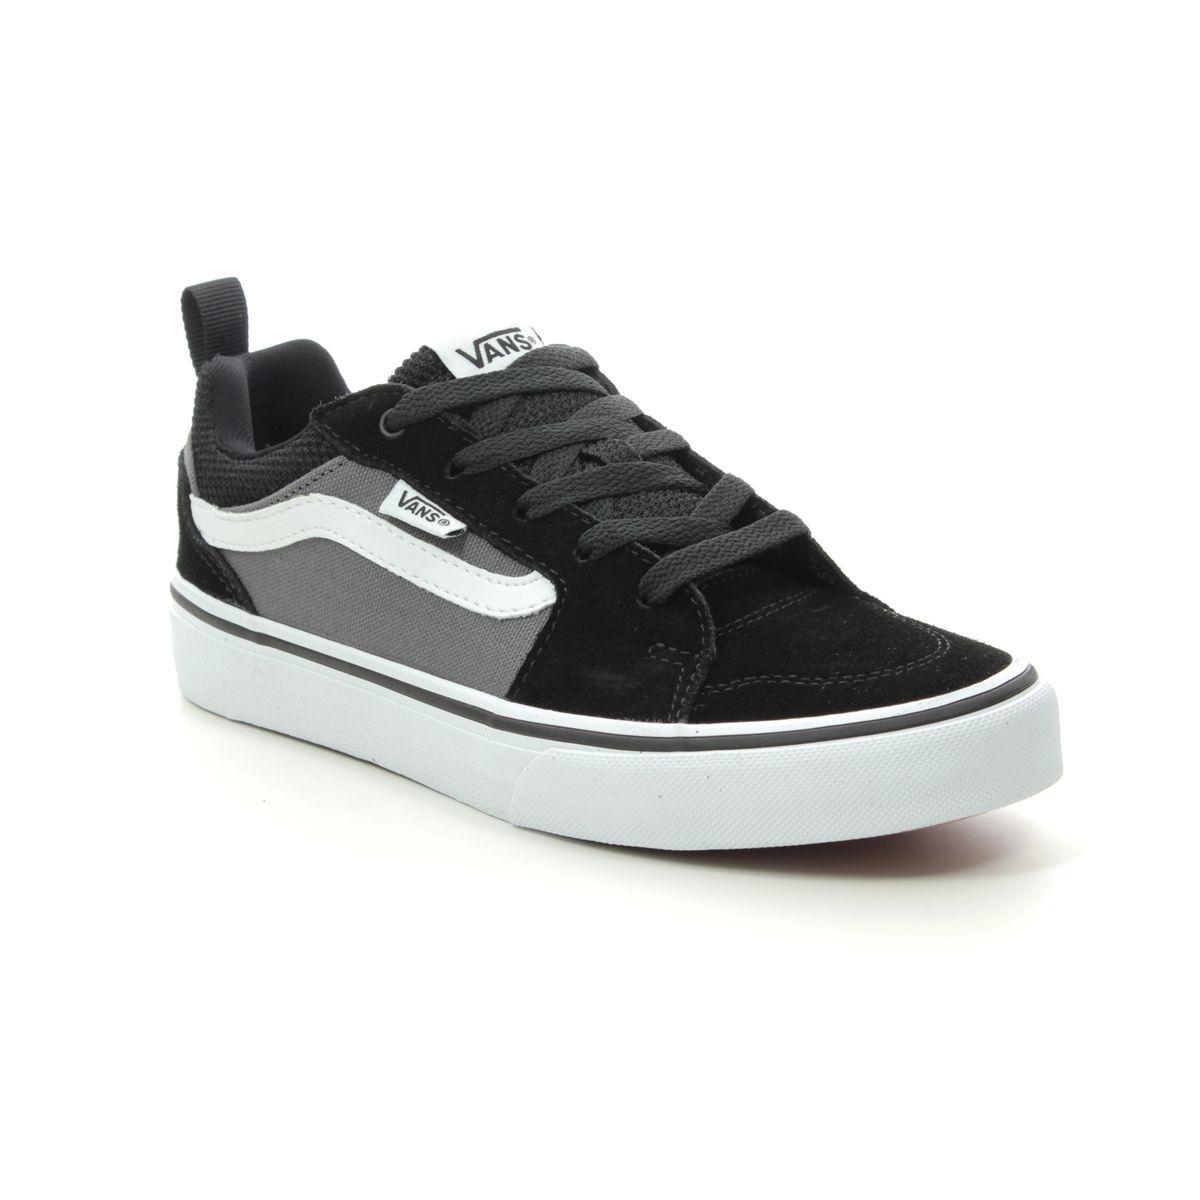 Vans Filmore Youth VN0A3MVPU-G71 Black